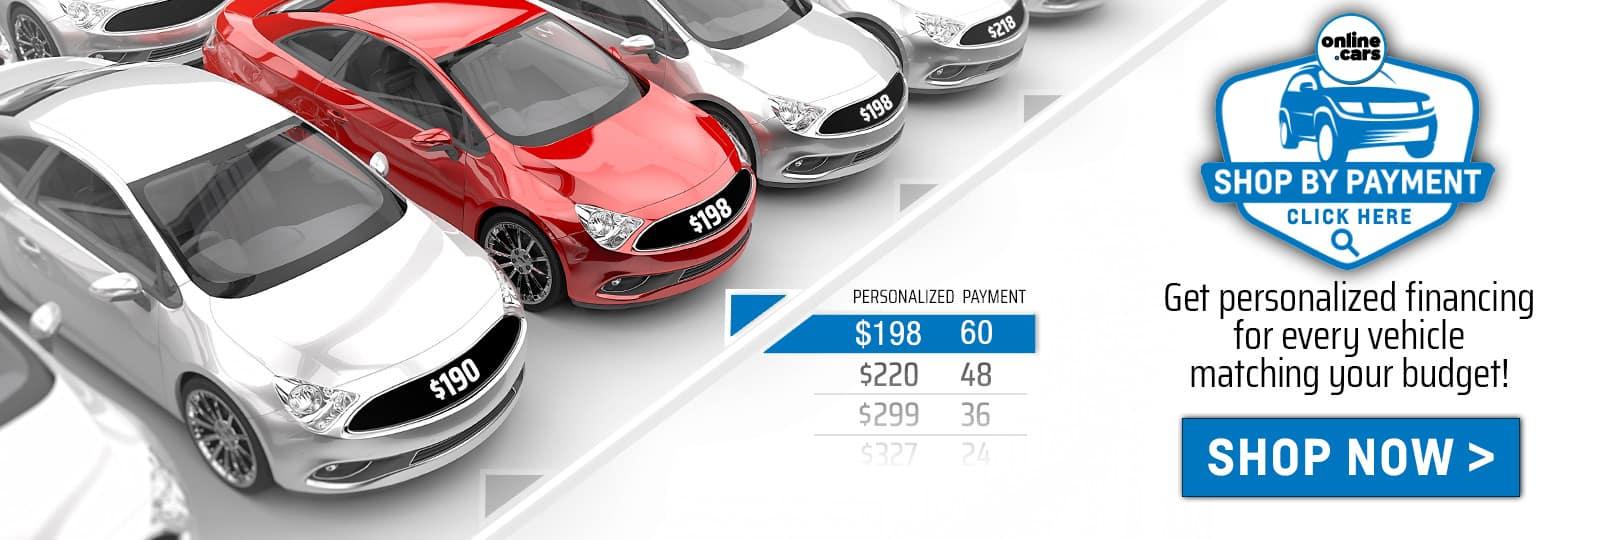 online.cars_Shop_By_Payment (high-rez)